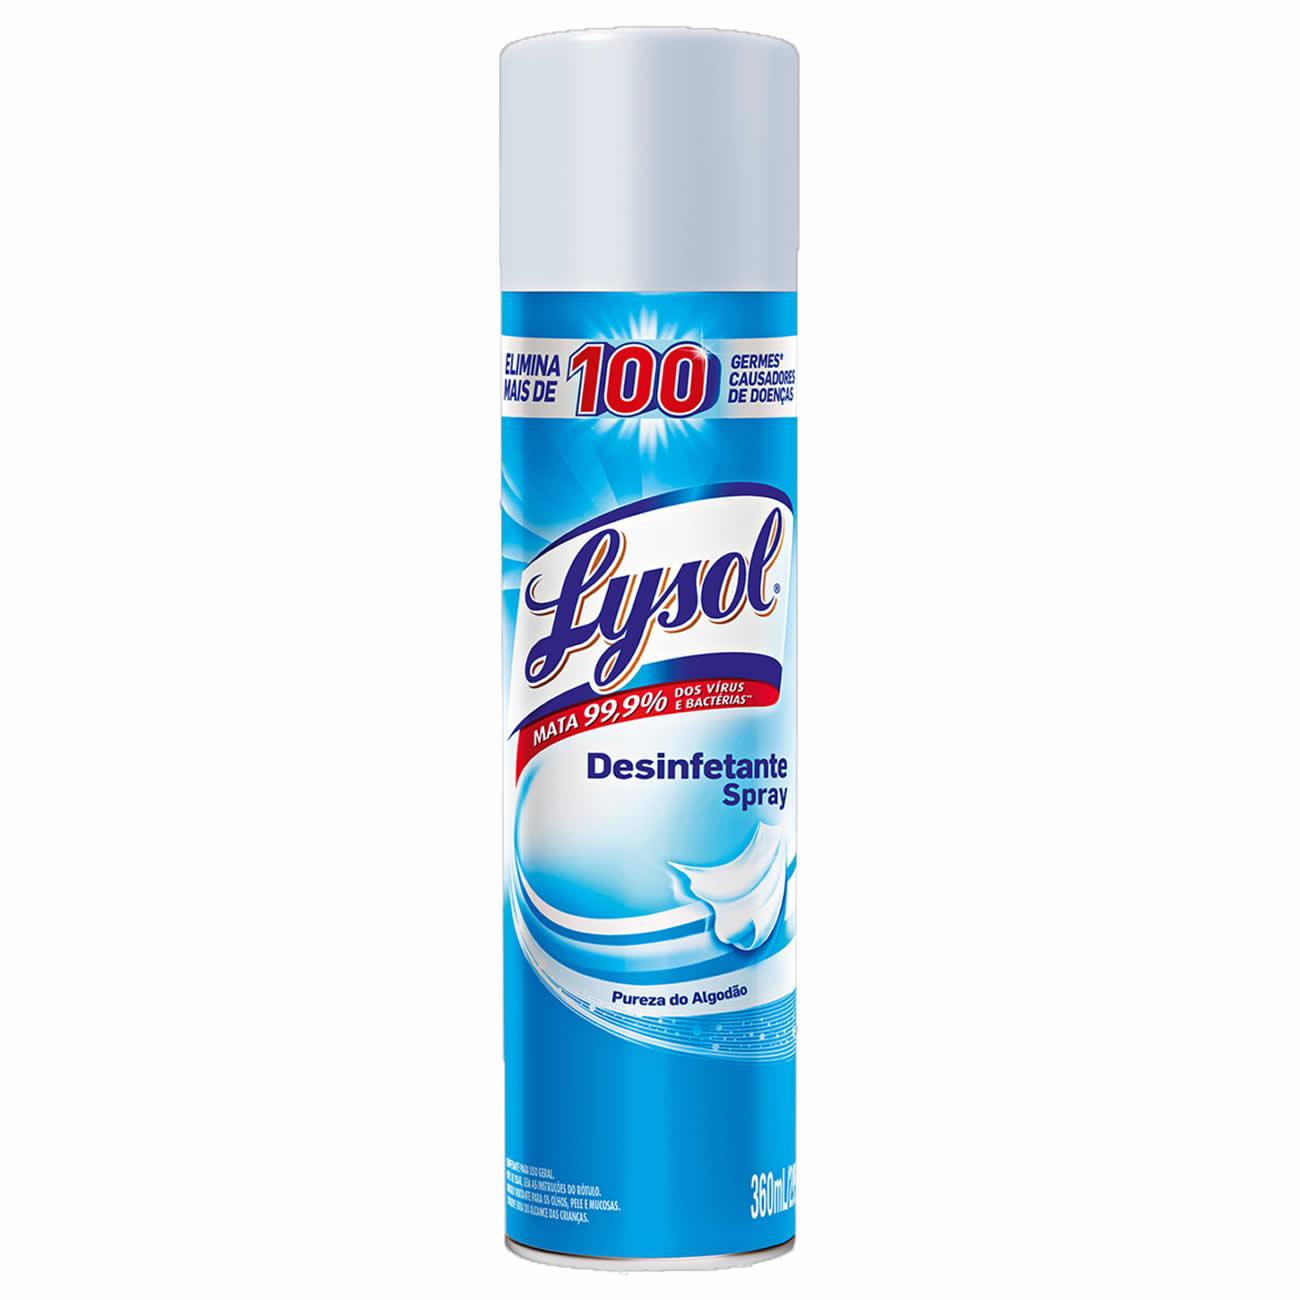 Desinfetante Aero Lysol Pureza do Algodao 360ml